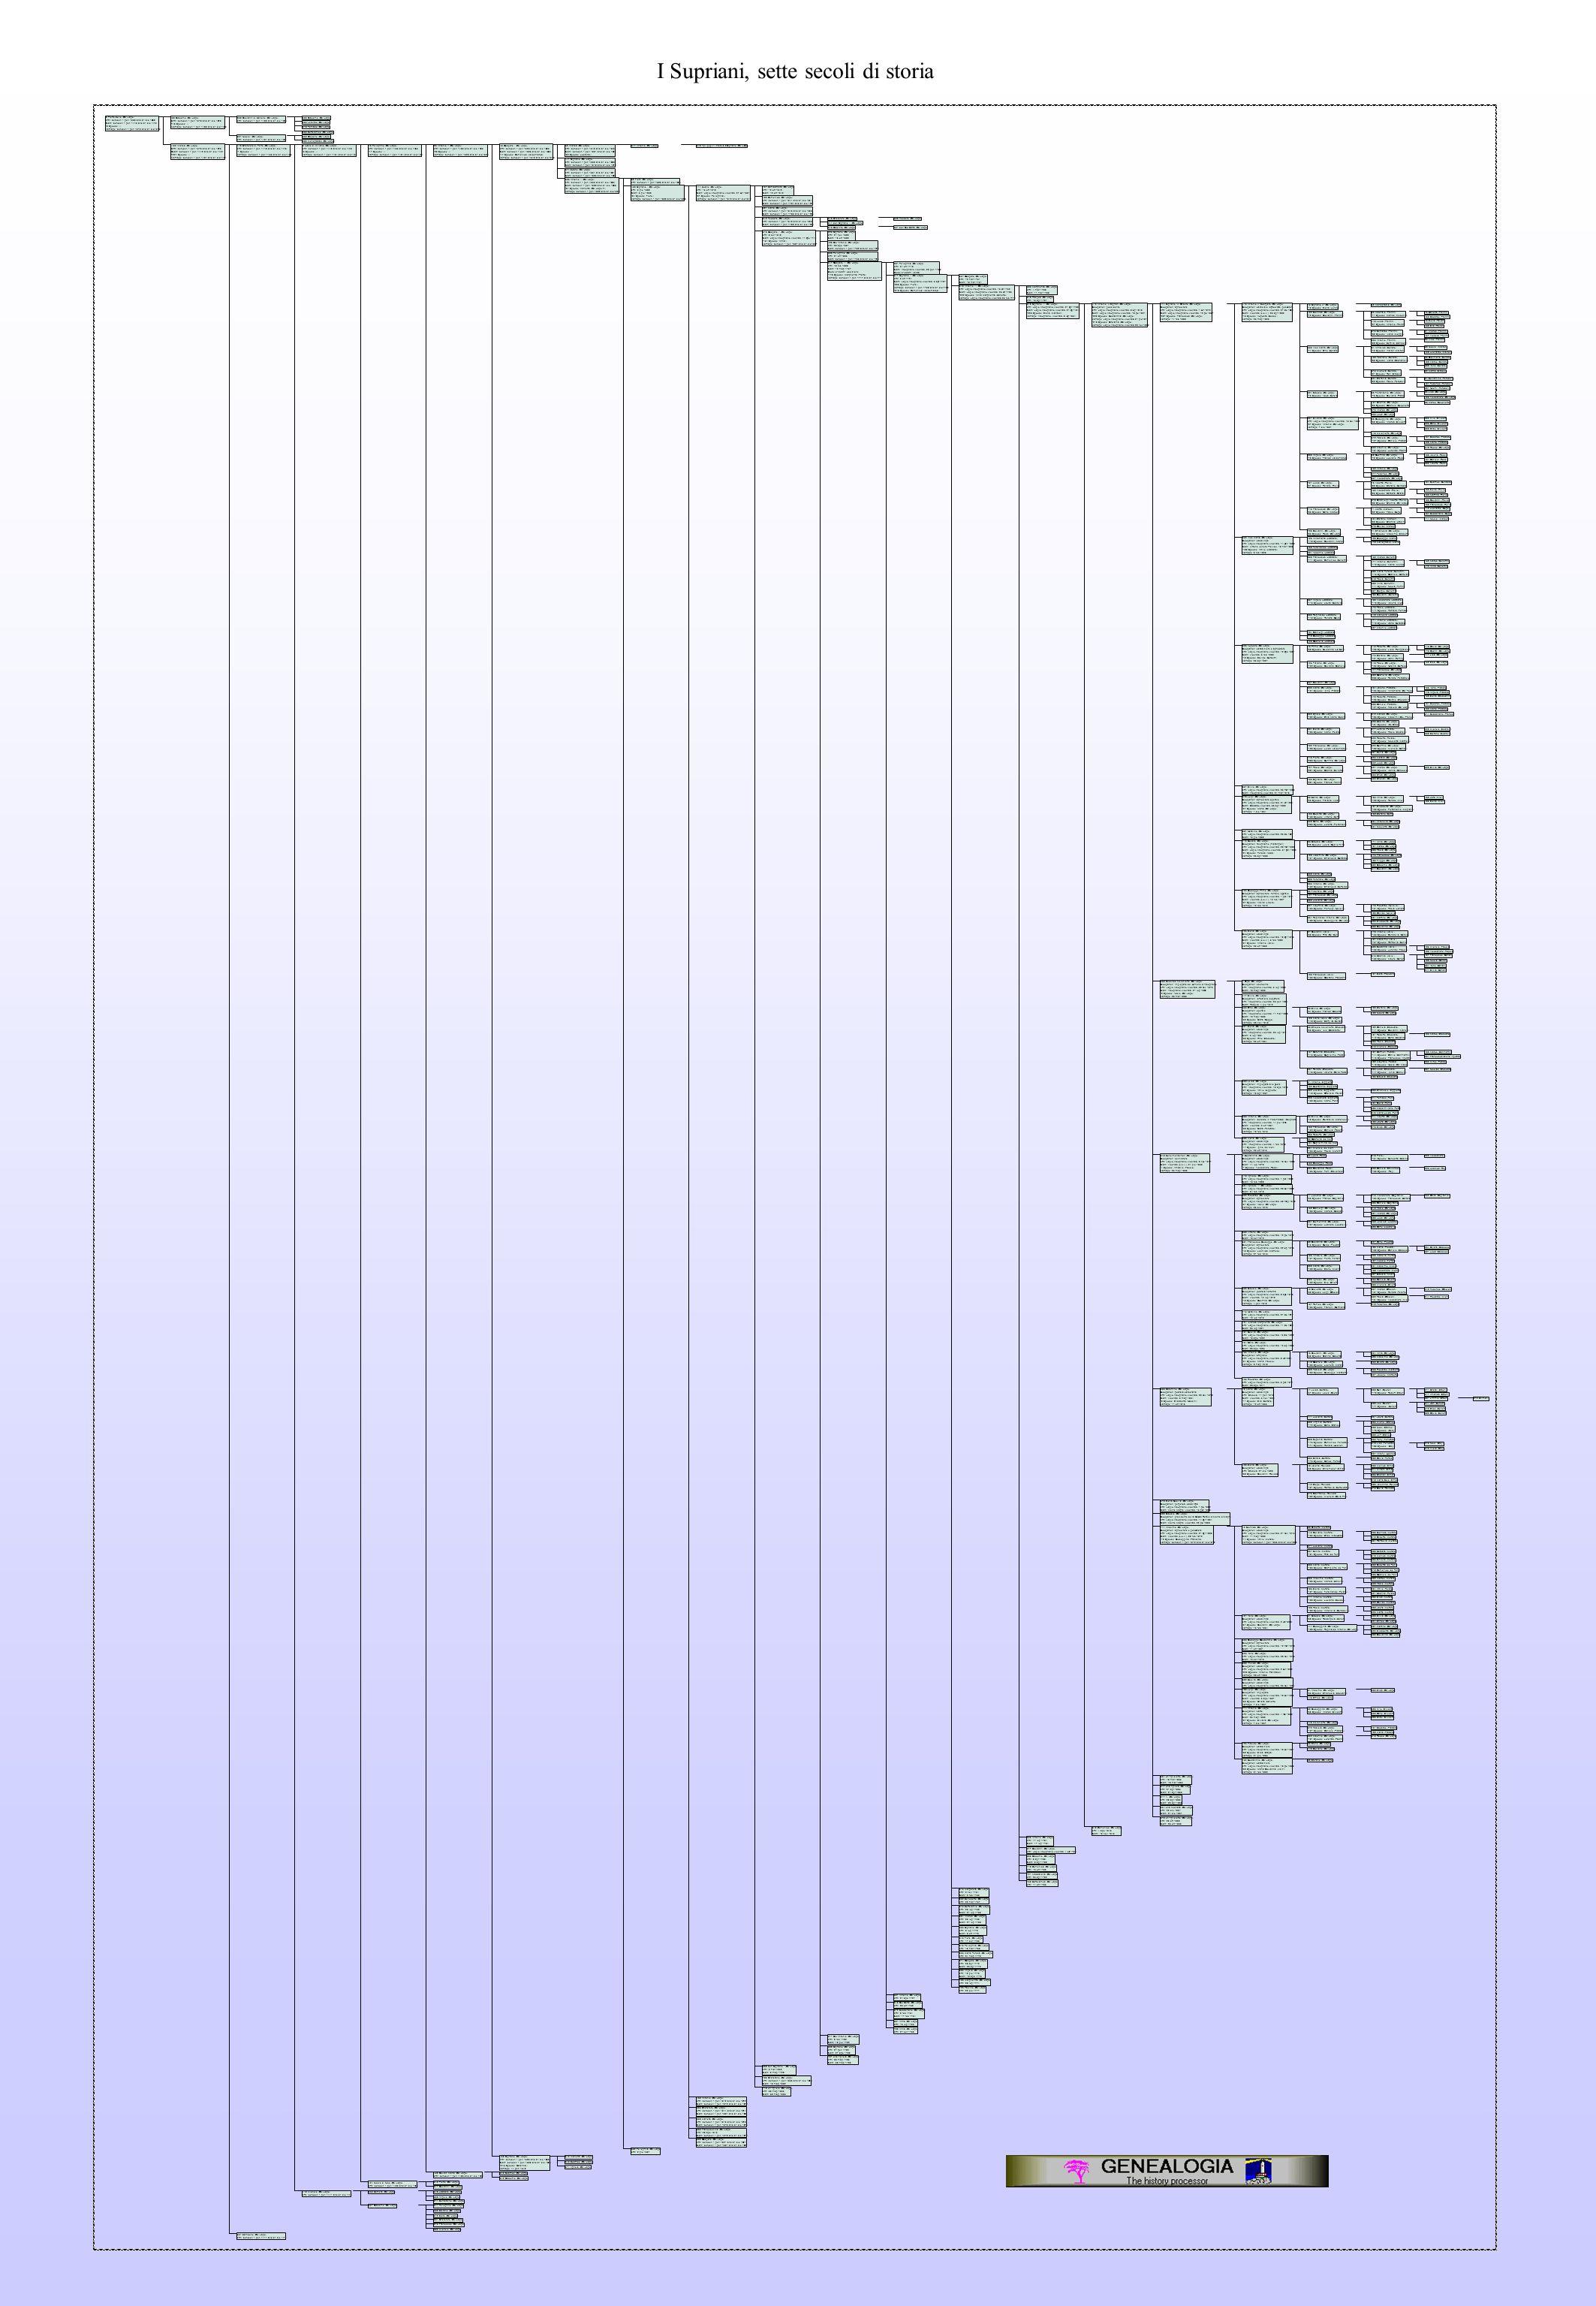 I0 Pietro Zullo /Dal Lago/ Birth: between 1 gen 1350 and 31 dic 1350 Death: between 1 gen 1415 and 31 dic 1415 F0 Spouse: // Marriage: between 1 gen 1